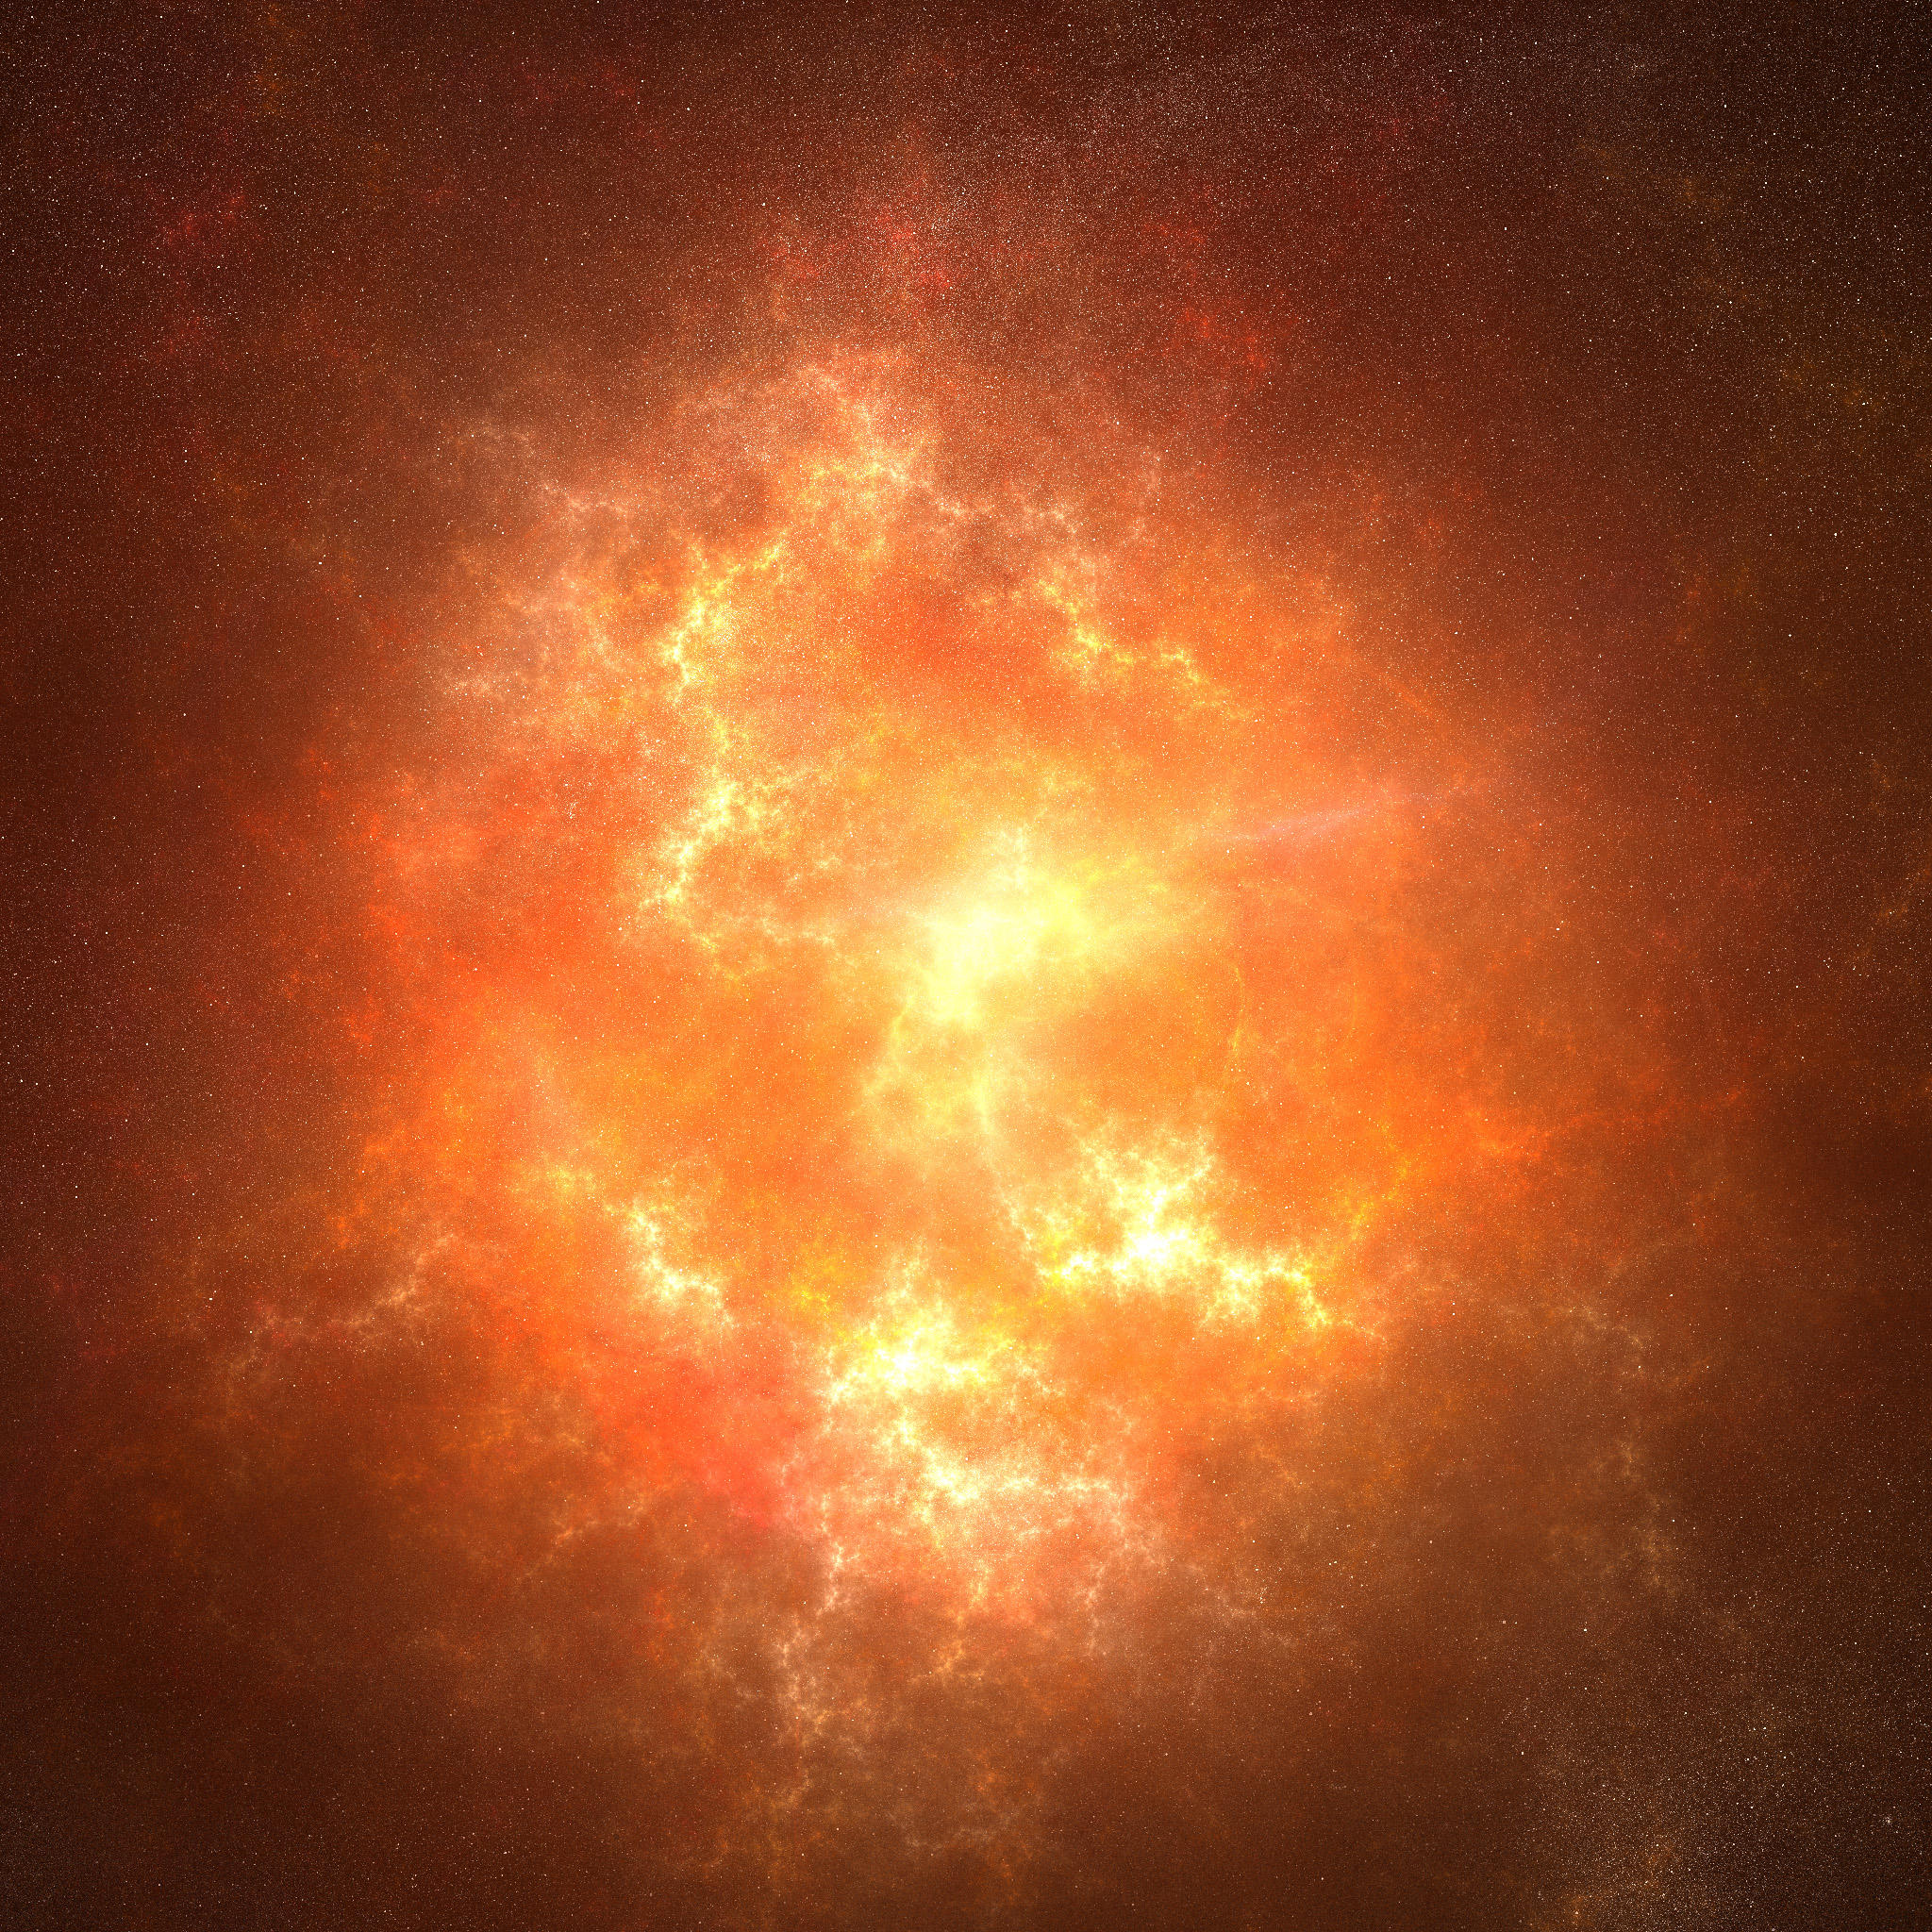 apophysis_nebula5 by Fune-Stock